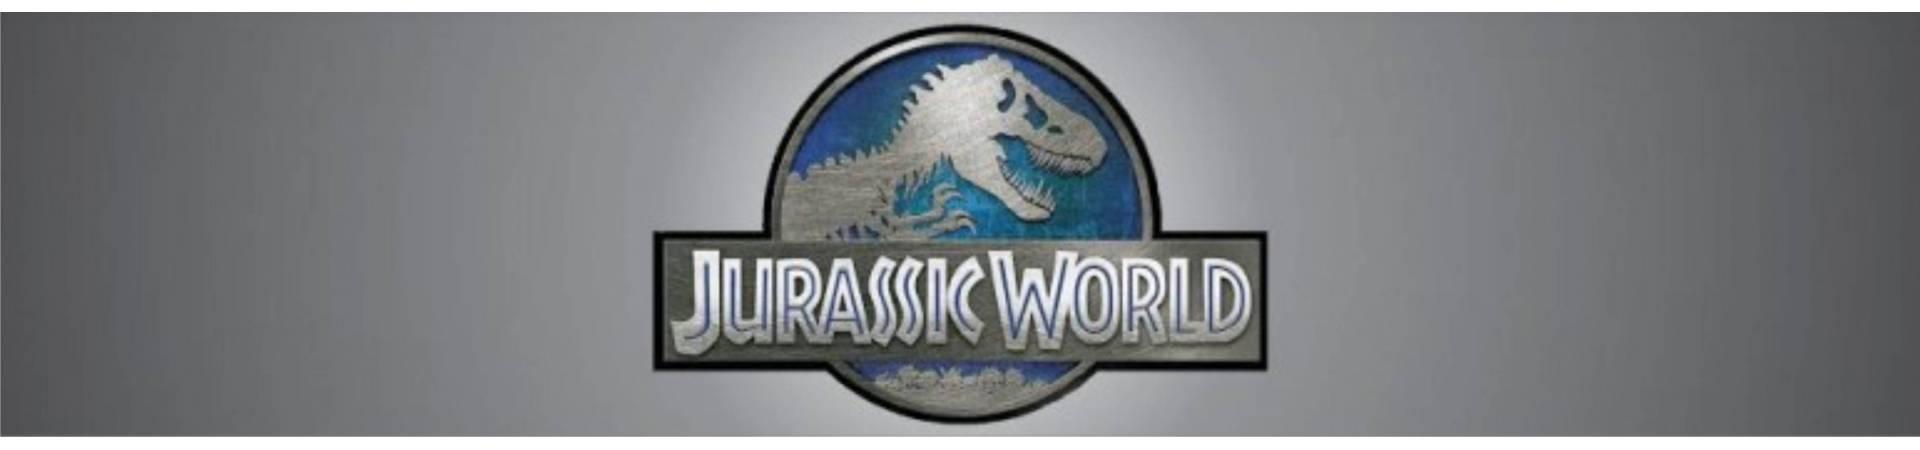 Jurassic Word